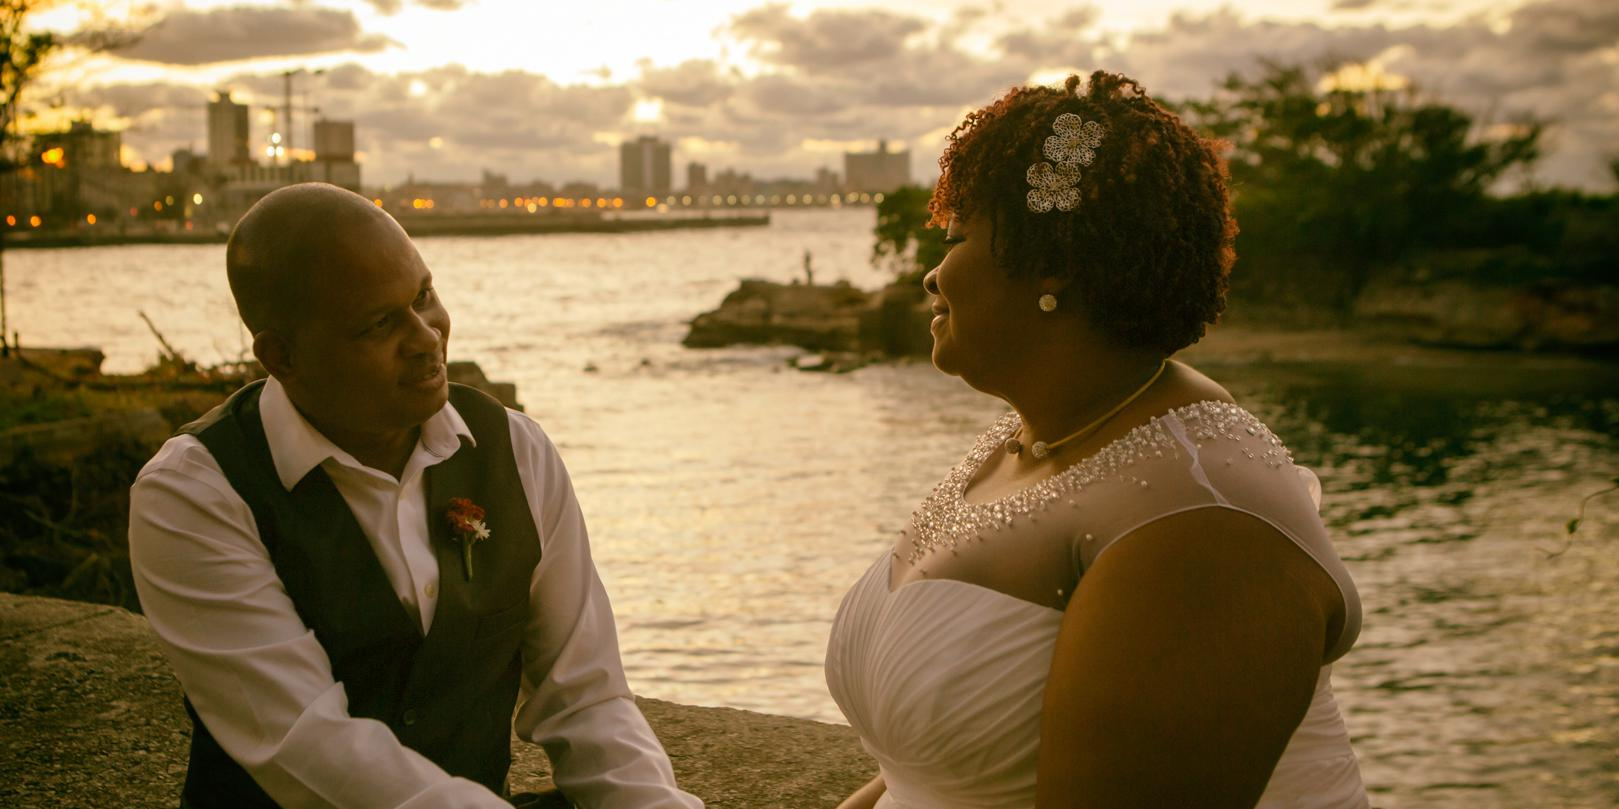 bodas-sin-clasificar-sin-tema-cuba-42151.jpg